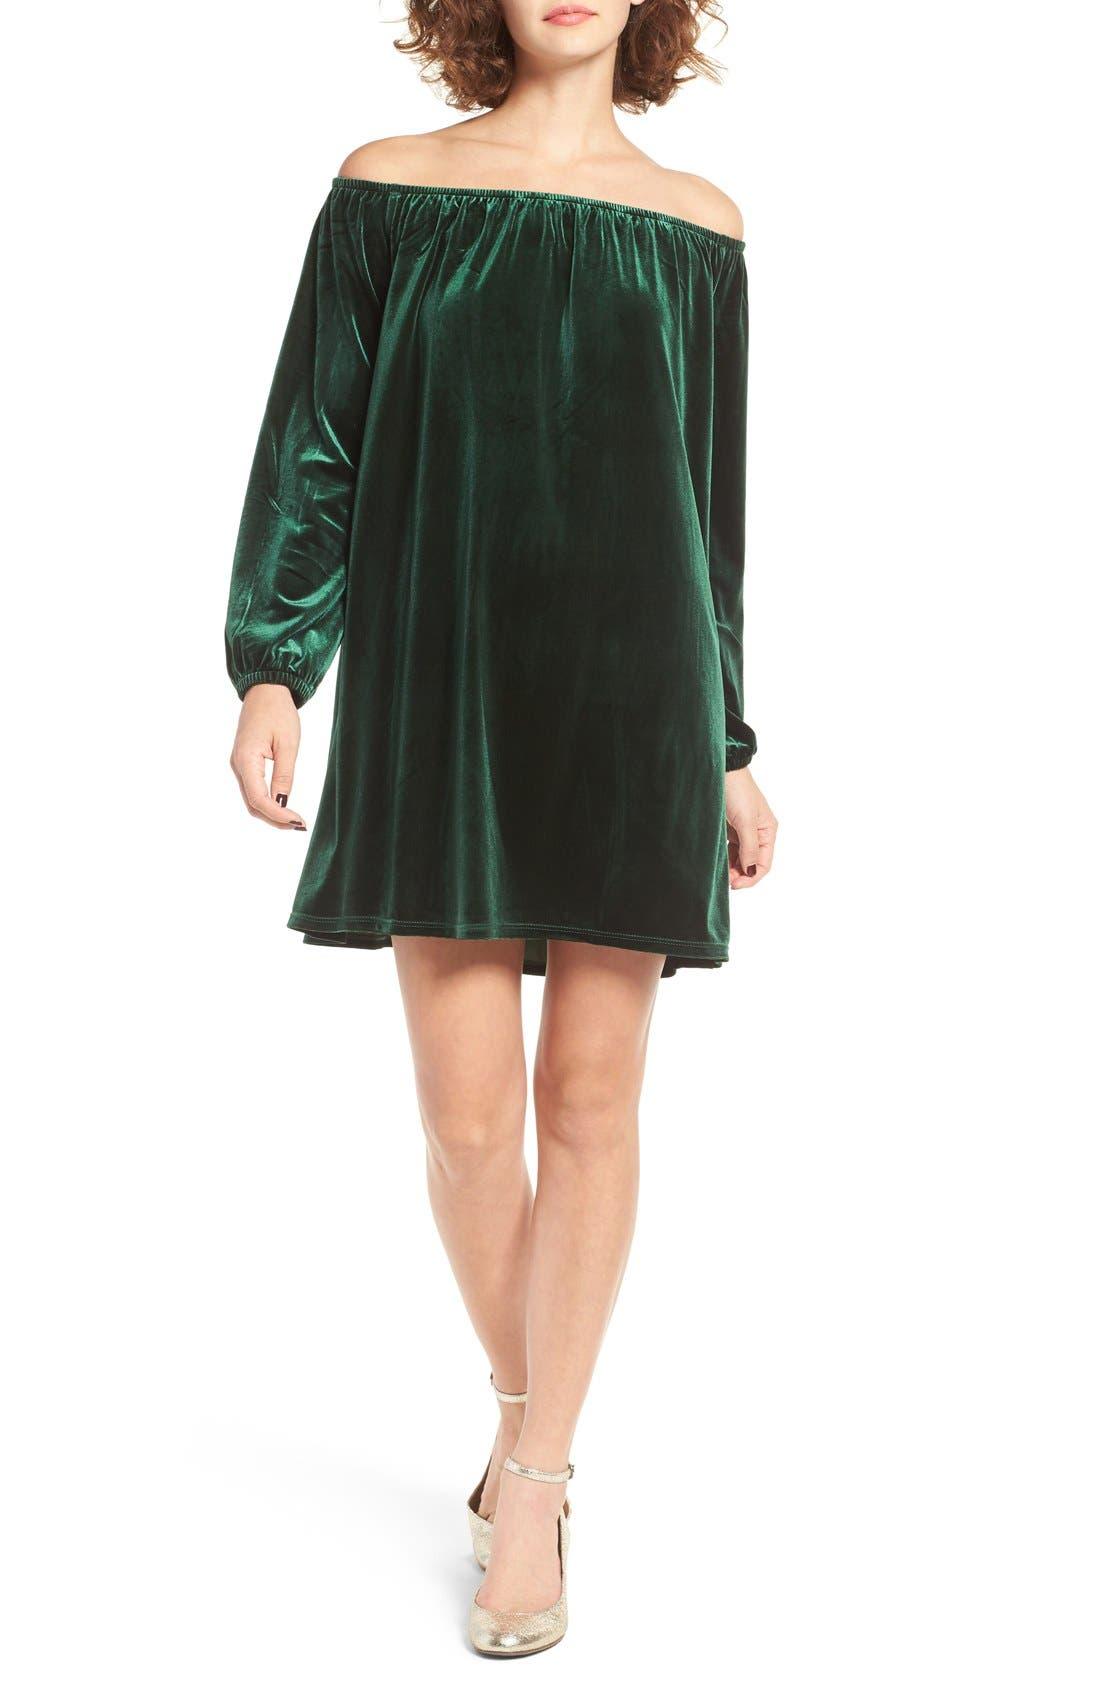 Alternate Image 1 Selected - One Clothing Off the Shoulder Velvet Swing Dress